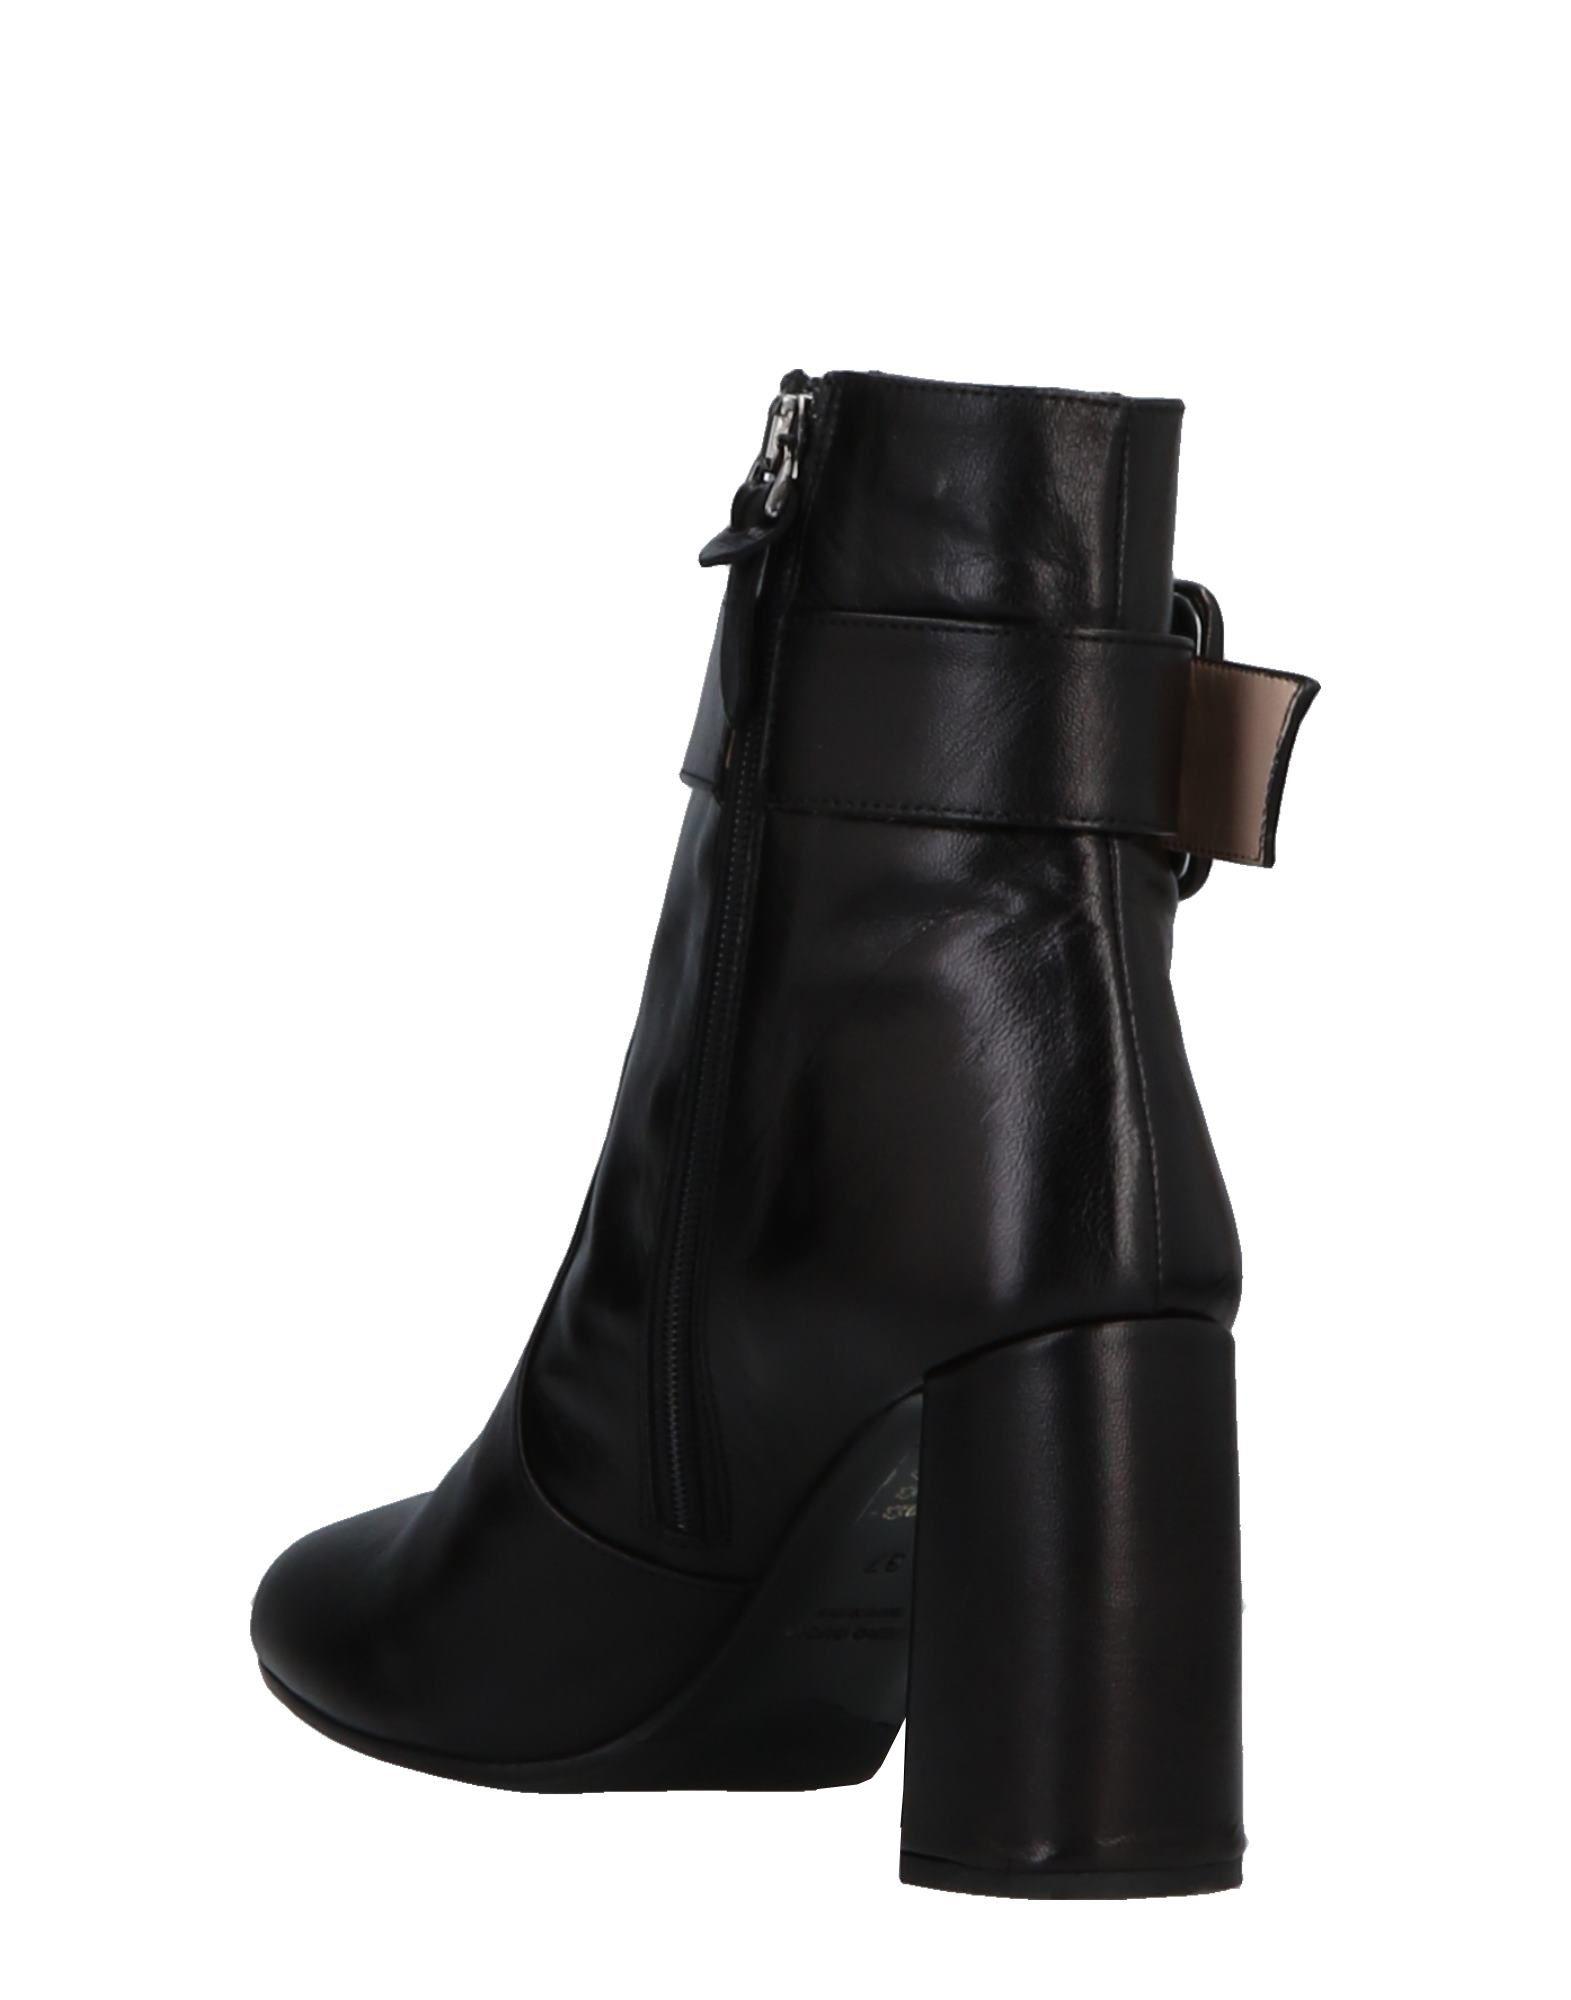 Settantatre Lr Stiefelette Damen   Damen 11515601NQGut aussehende strapazierfähige Schuhe 073edc